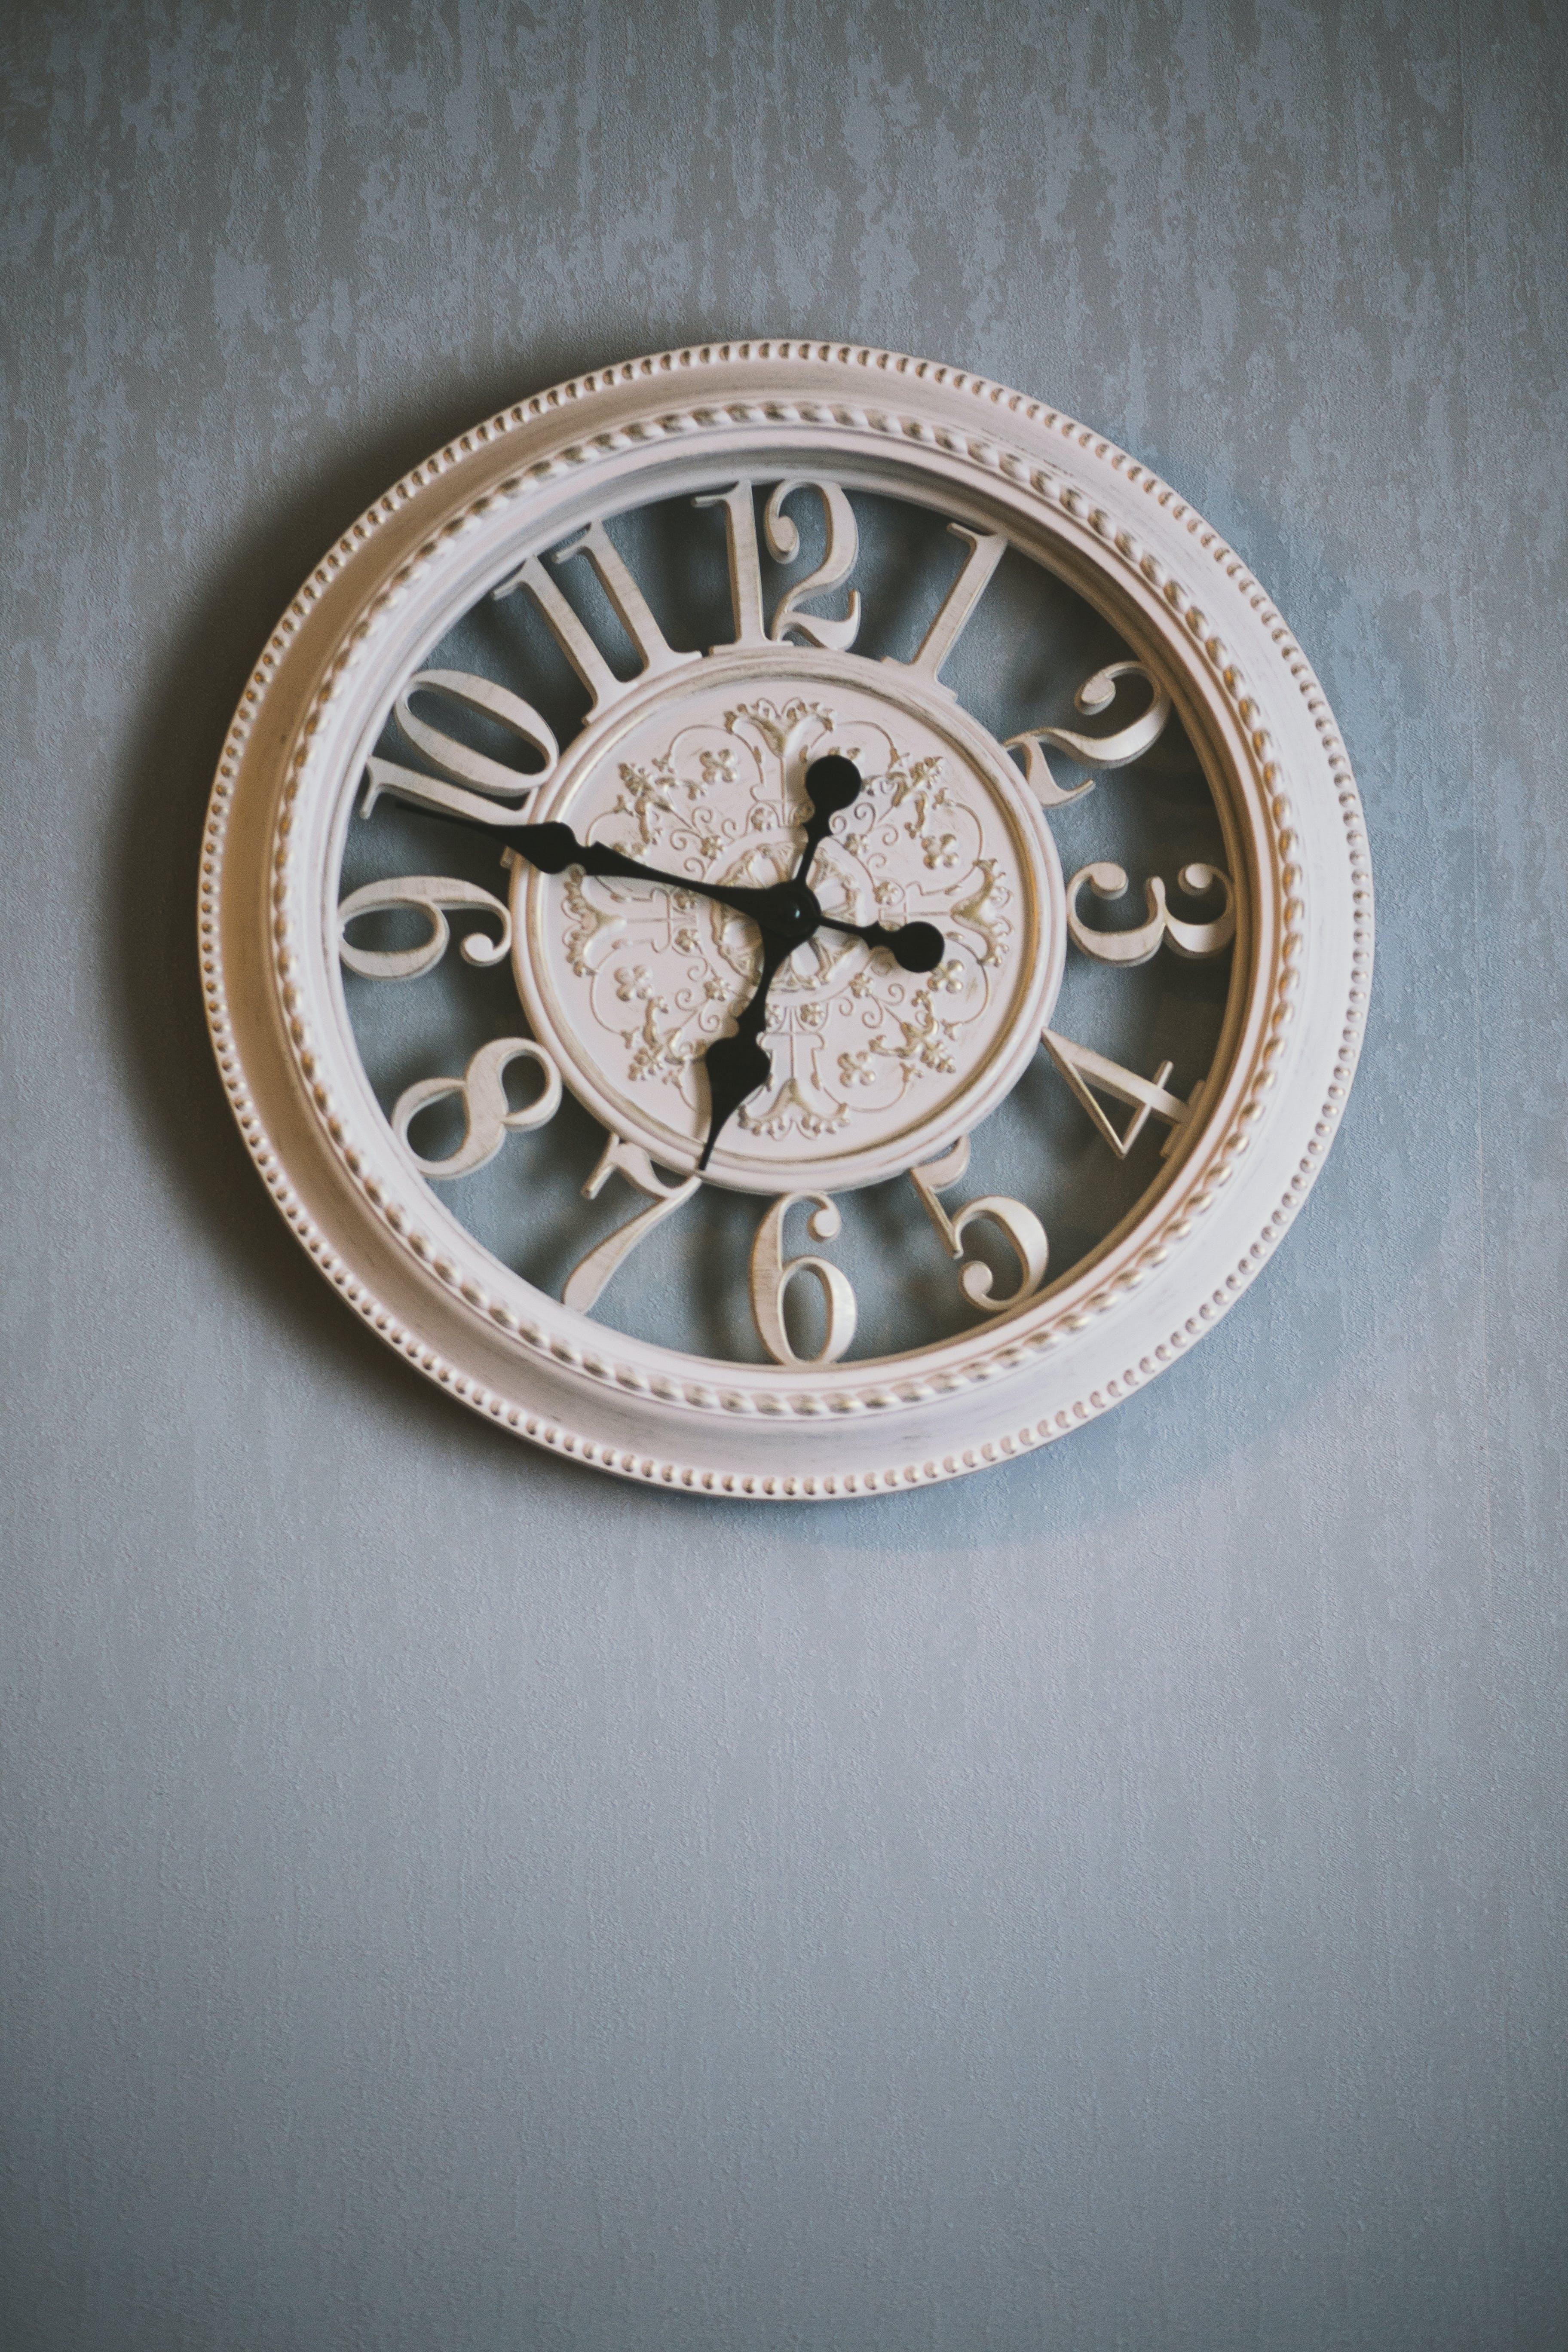 Round White Analog Clock Showing Time